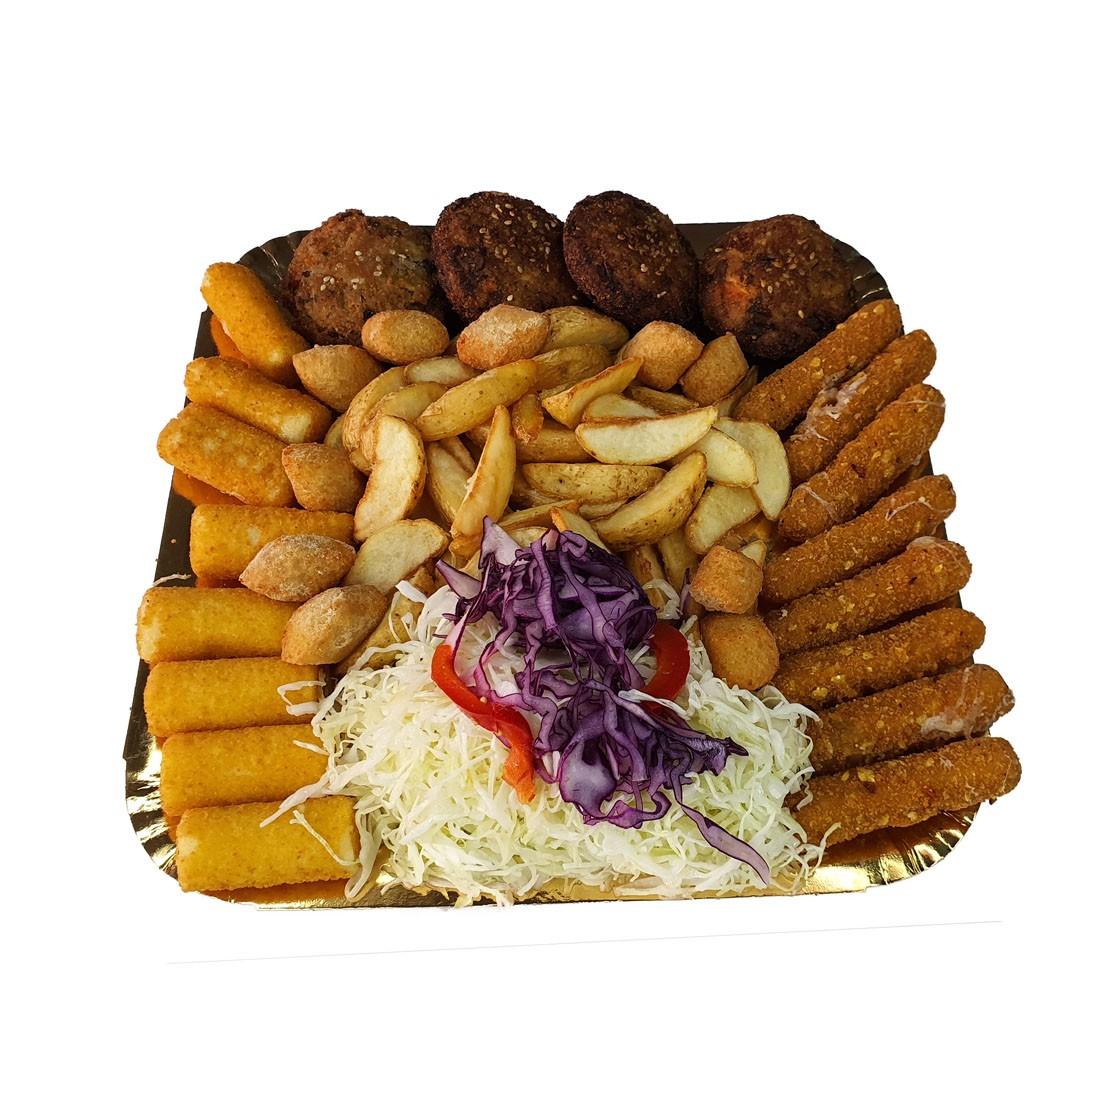 Platou 5 ovo-lacto-vegetarian – contine: gujoane de mozzarella, crochete de cartofi, chiftelute de legume, cartofi wedges, salata de varza alba si rosie, gogosari in otet